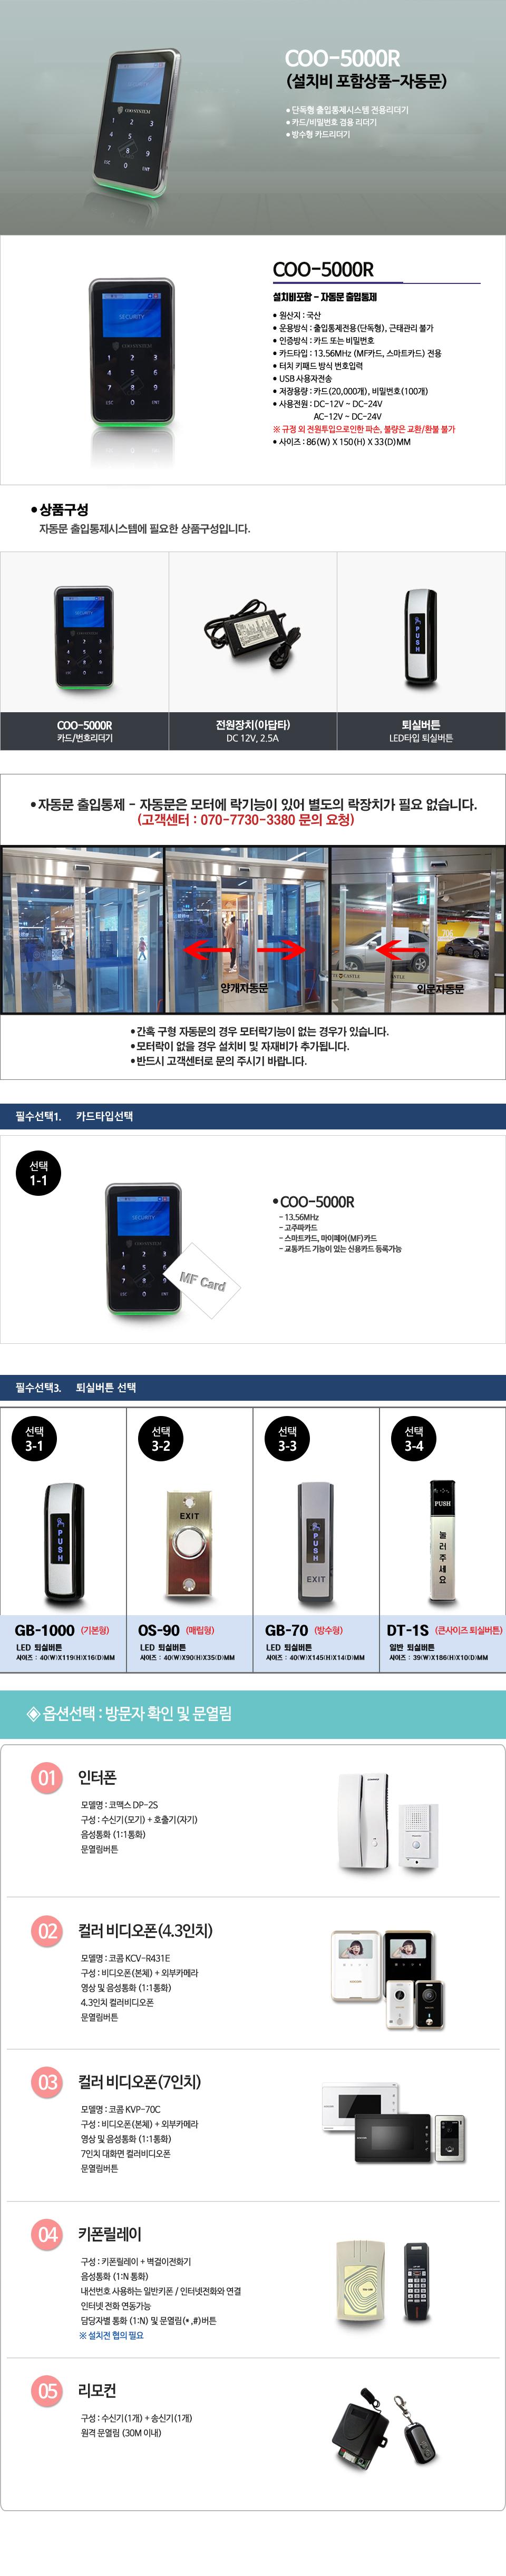 COO-5000R설치비포함작업-자동문.jpg